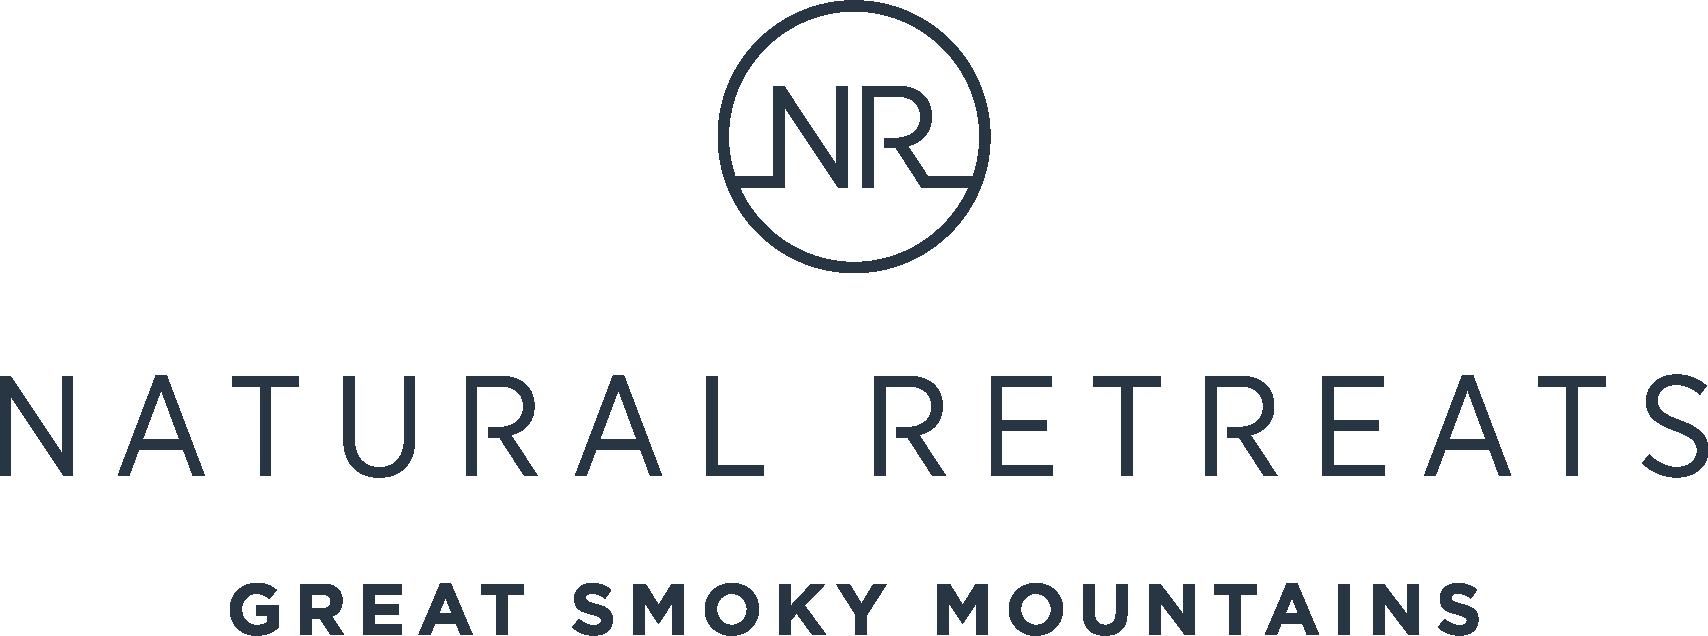 Natural Retreats Great Smoky Mountains